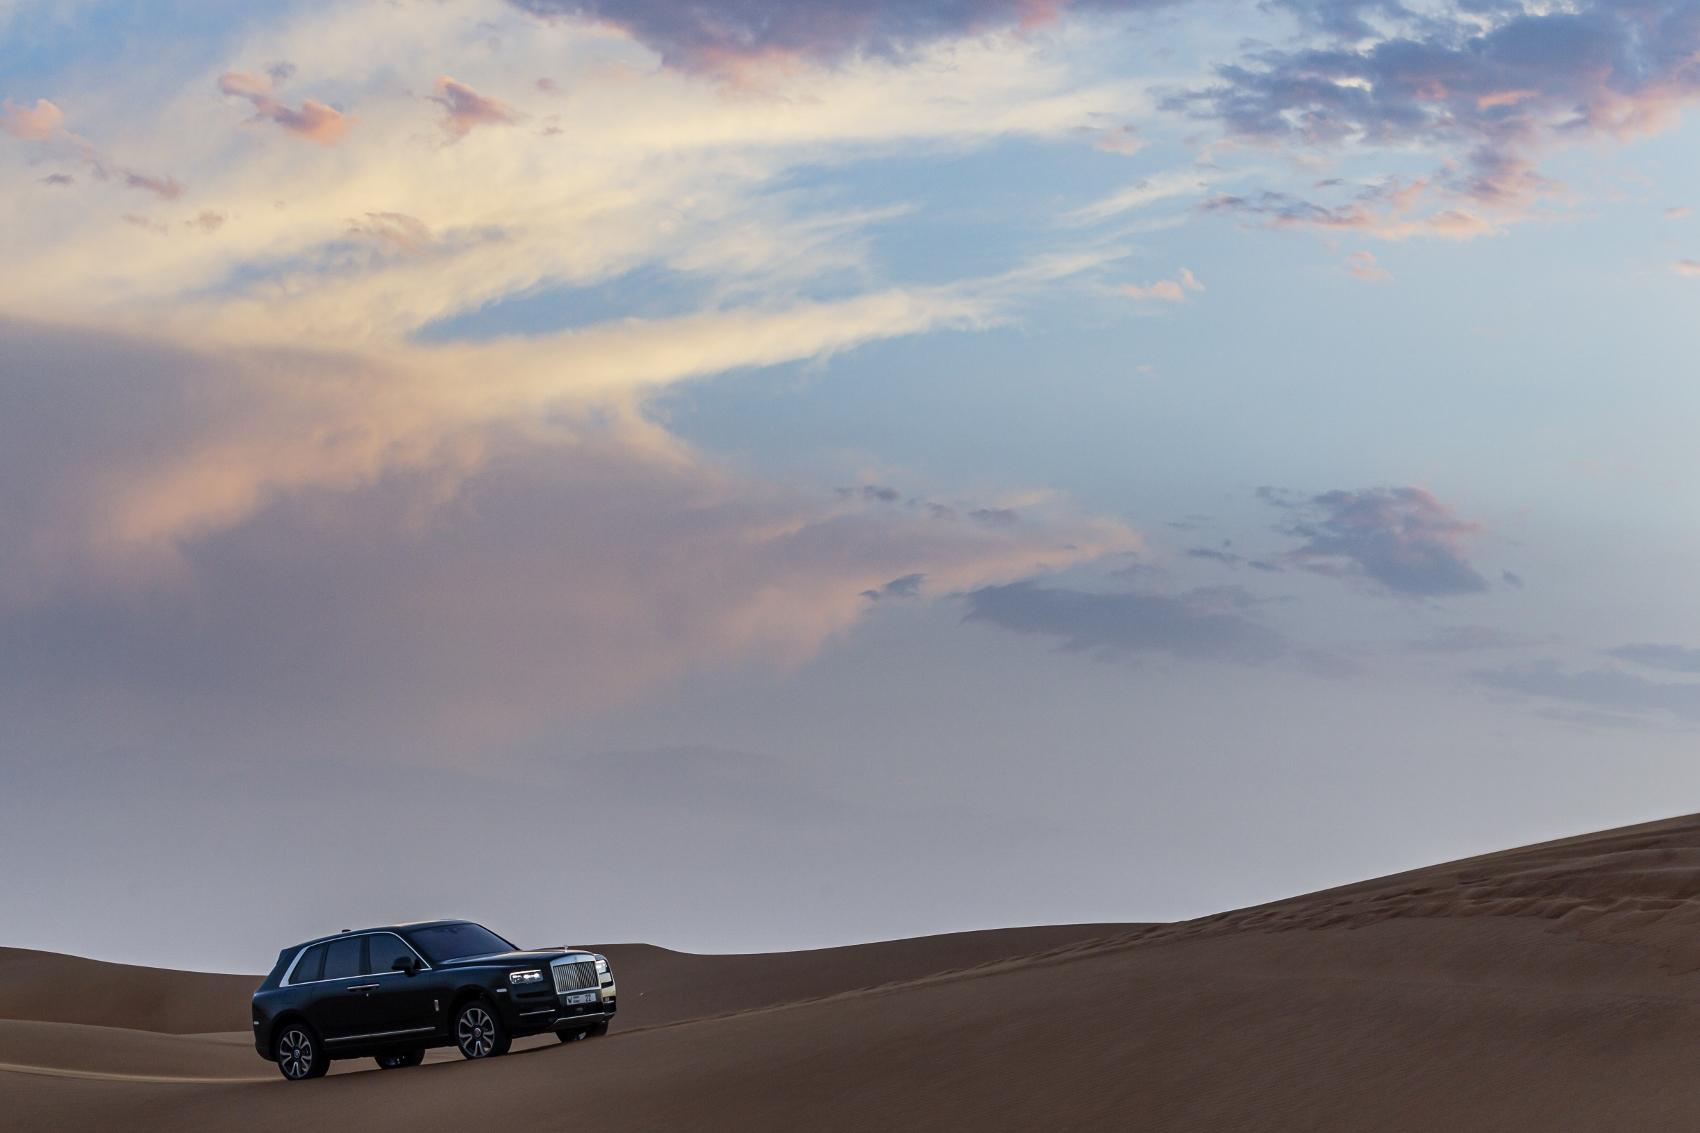 Rolls Royce Cullinan sa predviedol na púšti. Pozrite si foto aj video 9BuAOc9AXm rolls-royce-cullina